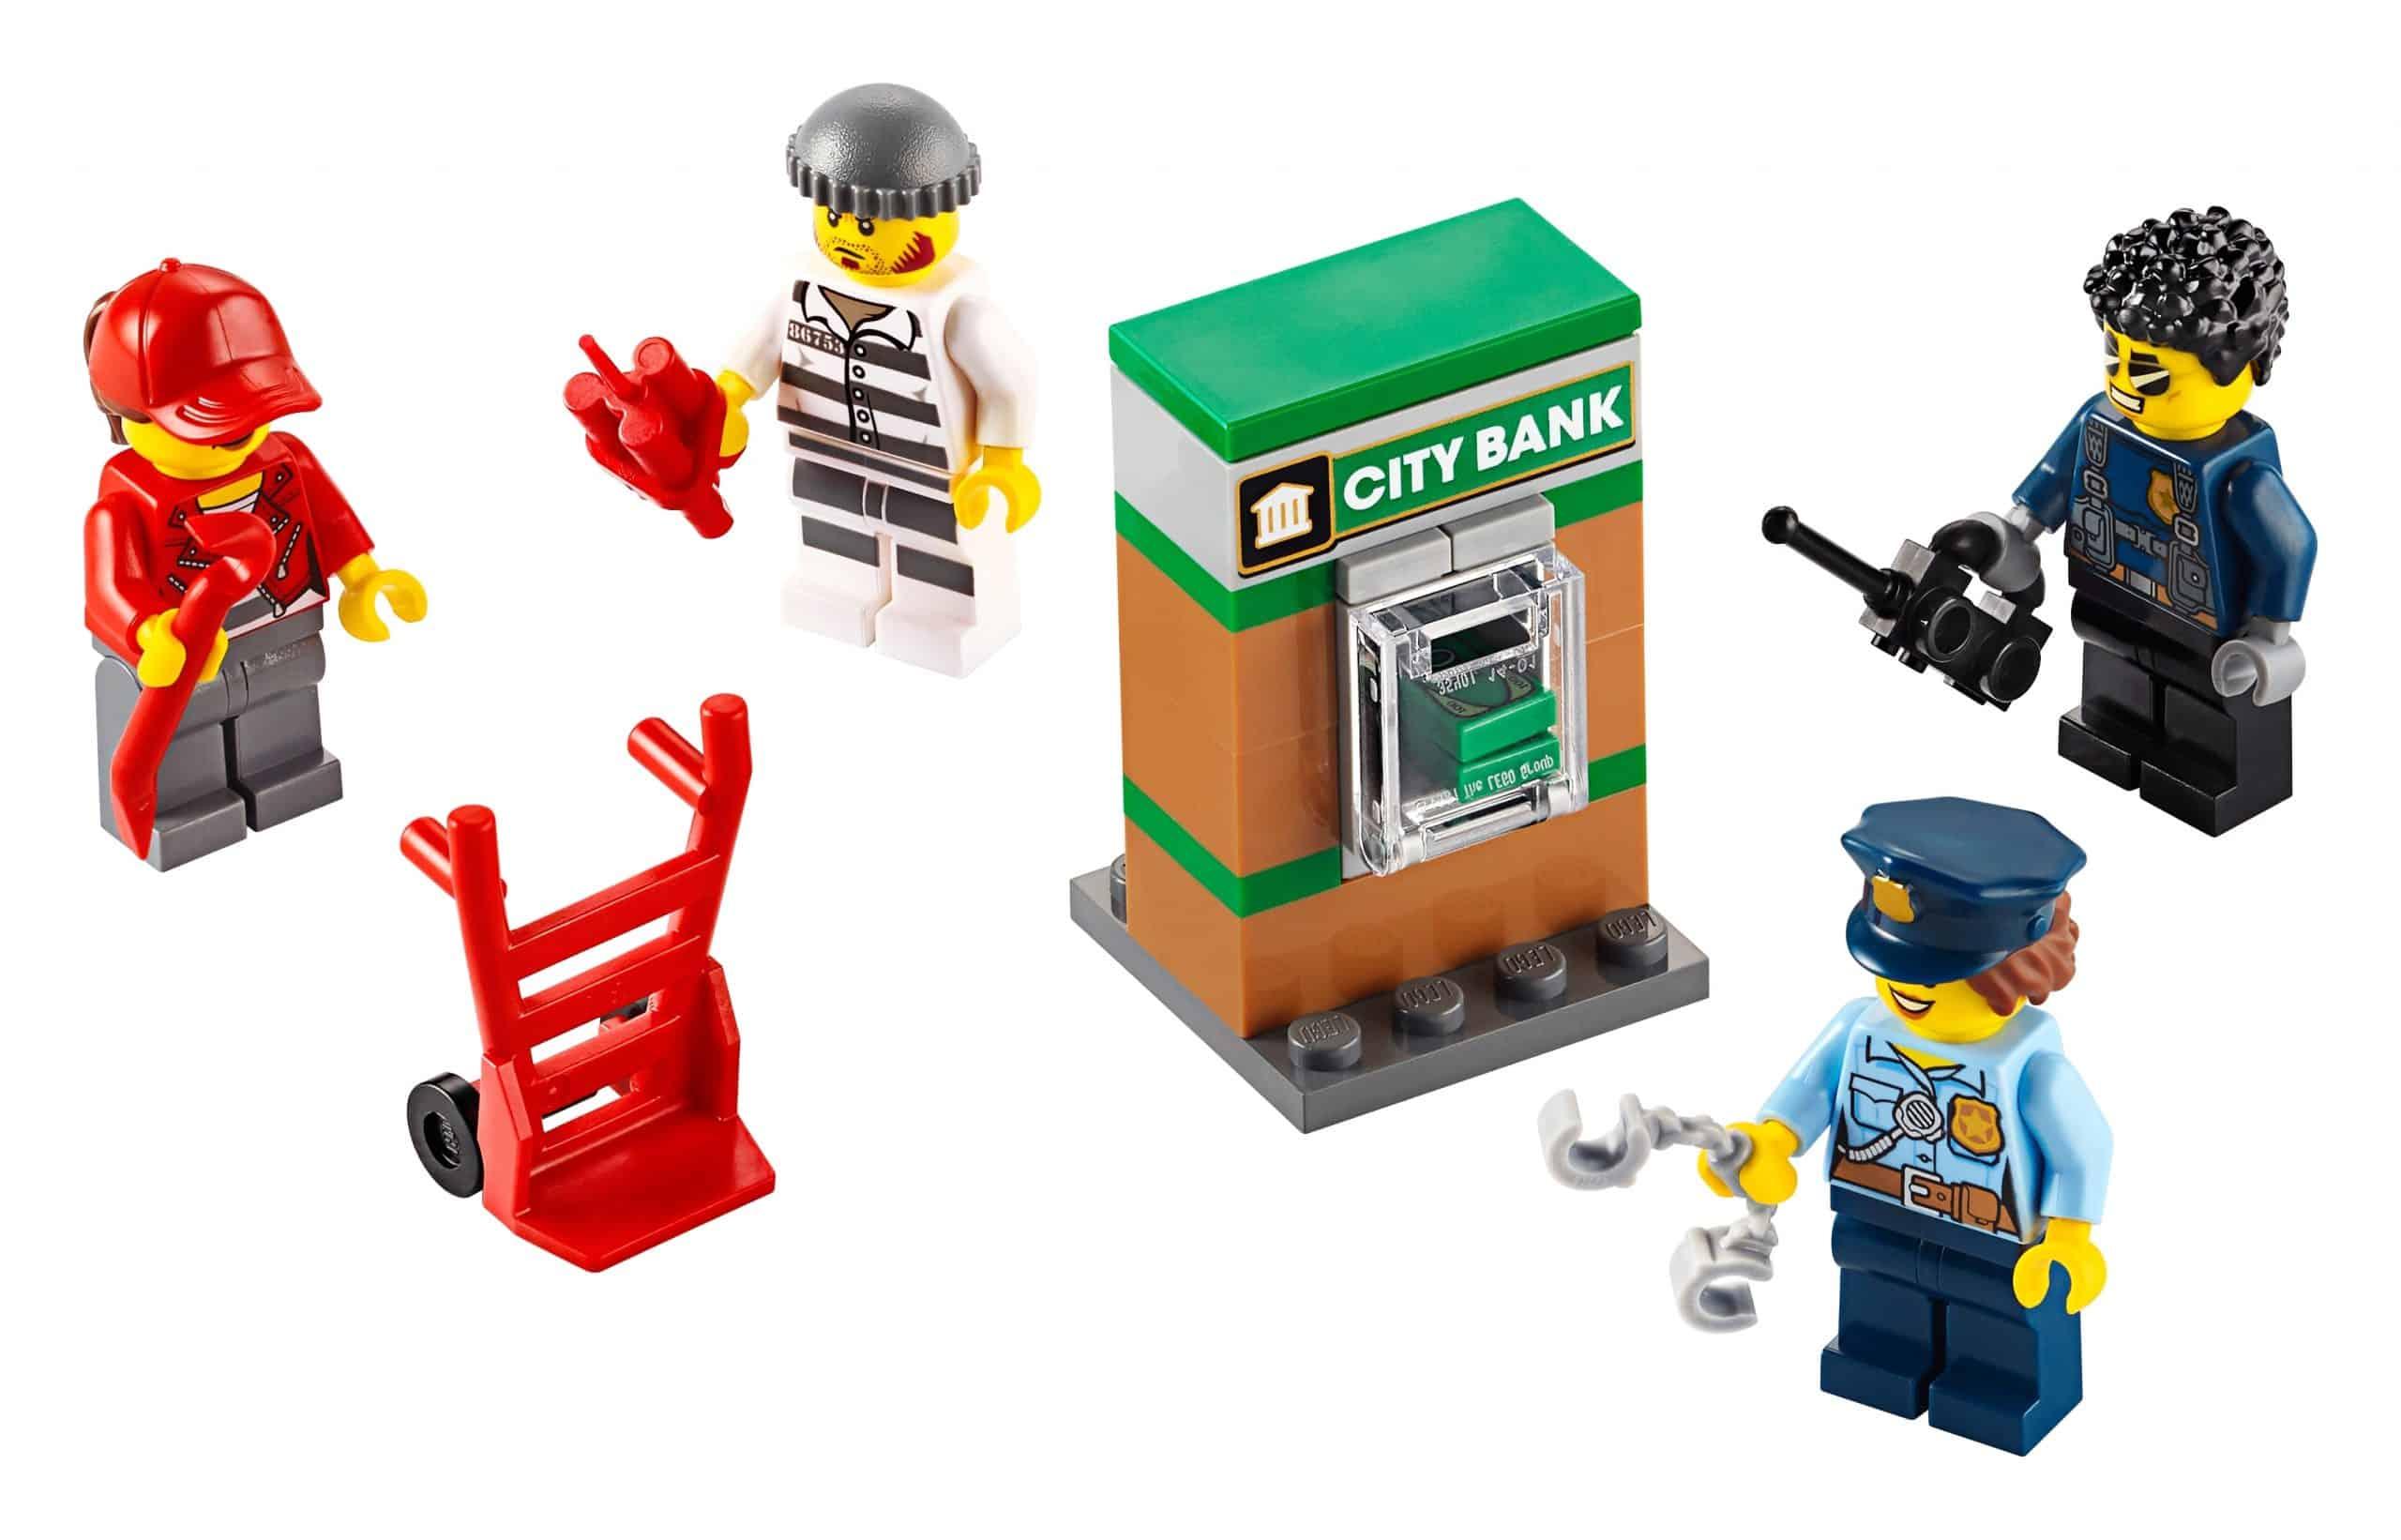 lego politie mf accessoireset 40372 scaled